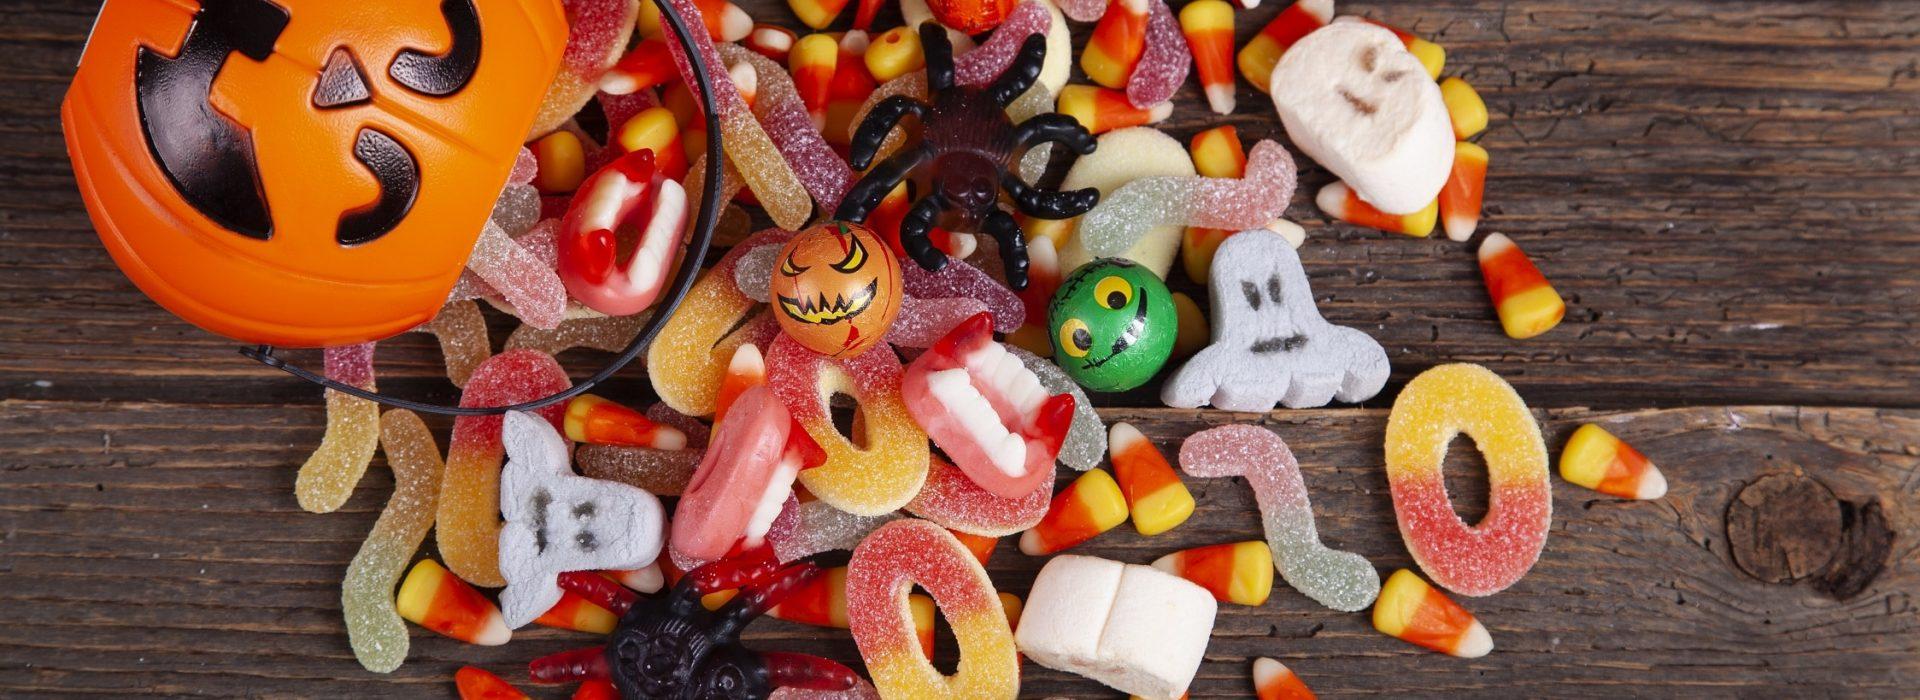 Scary Candies - Dessert Advisor